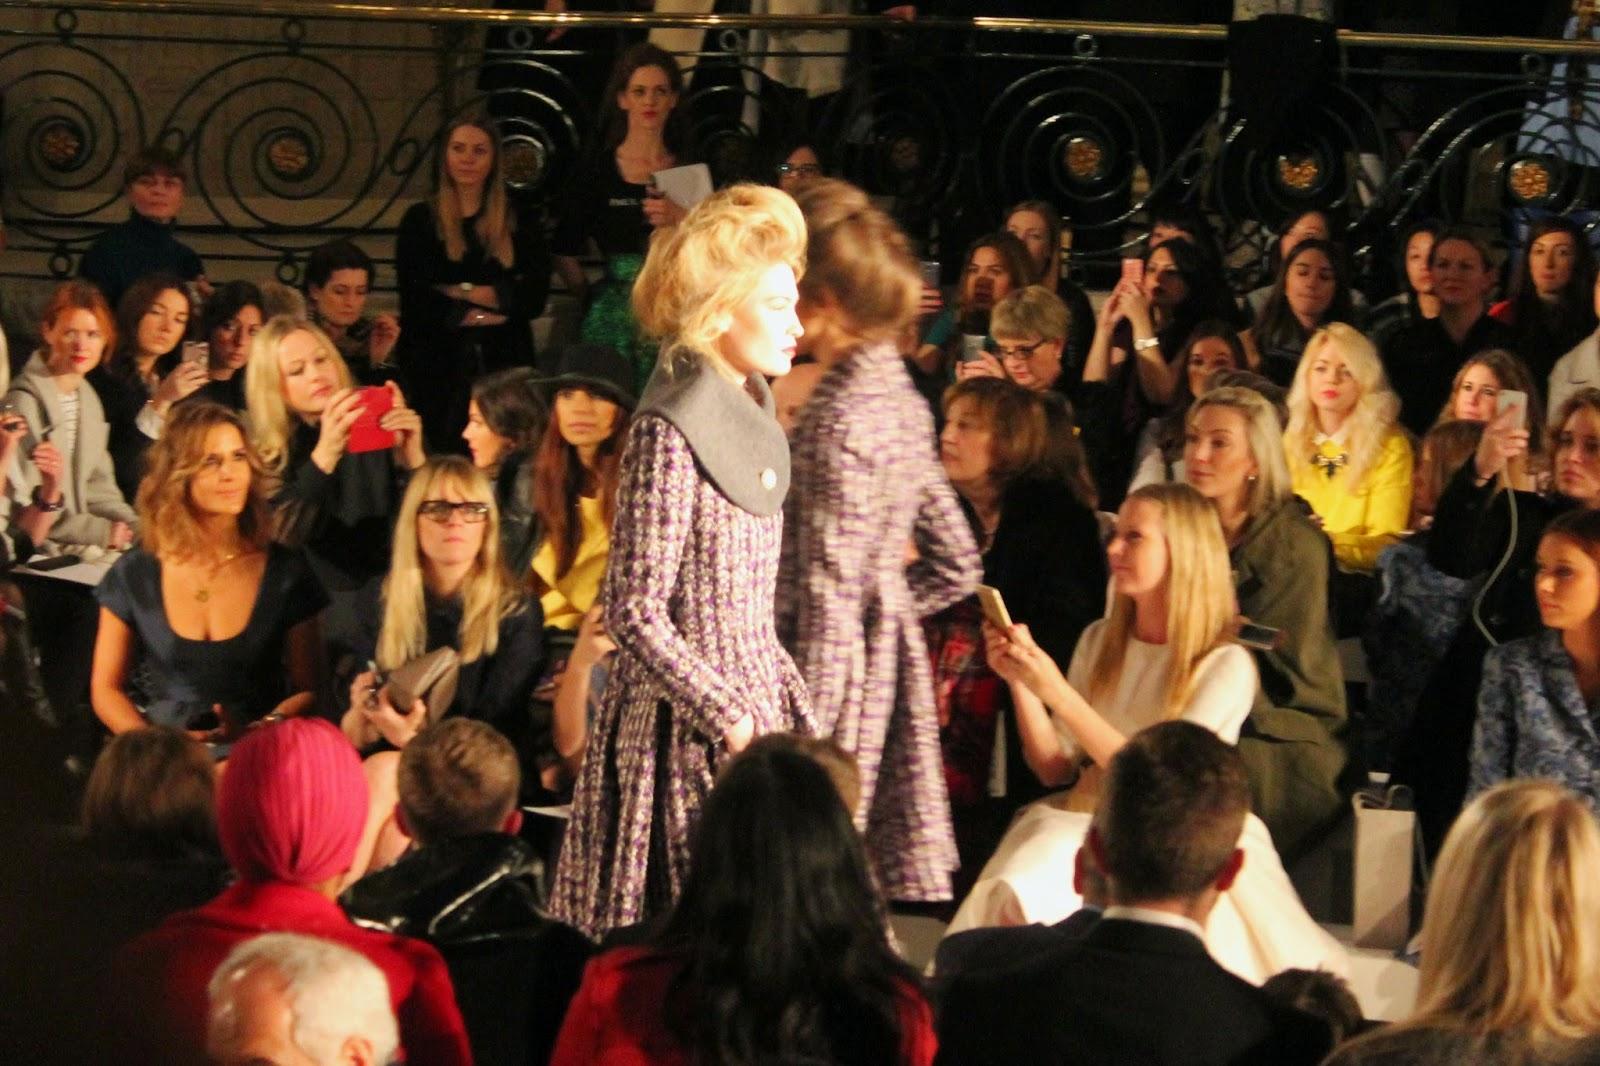 london-fashion-week-lfw-paul-costelloe-waldorf-hilton-catwalk-models-runway-dresses-collection-spring-summer-2015-ss15